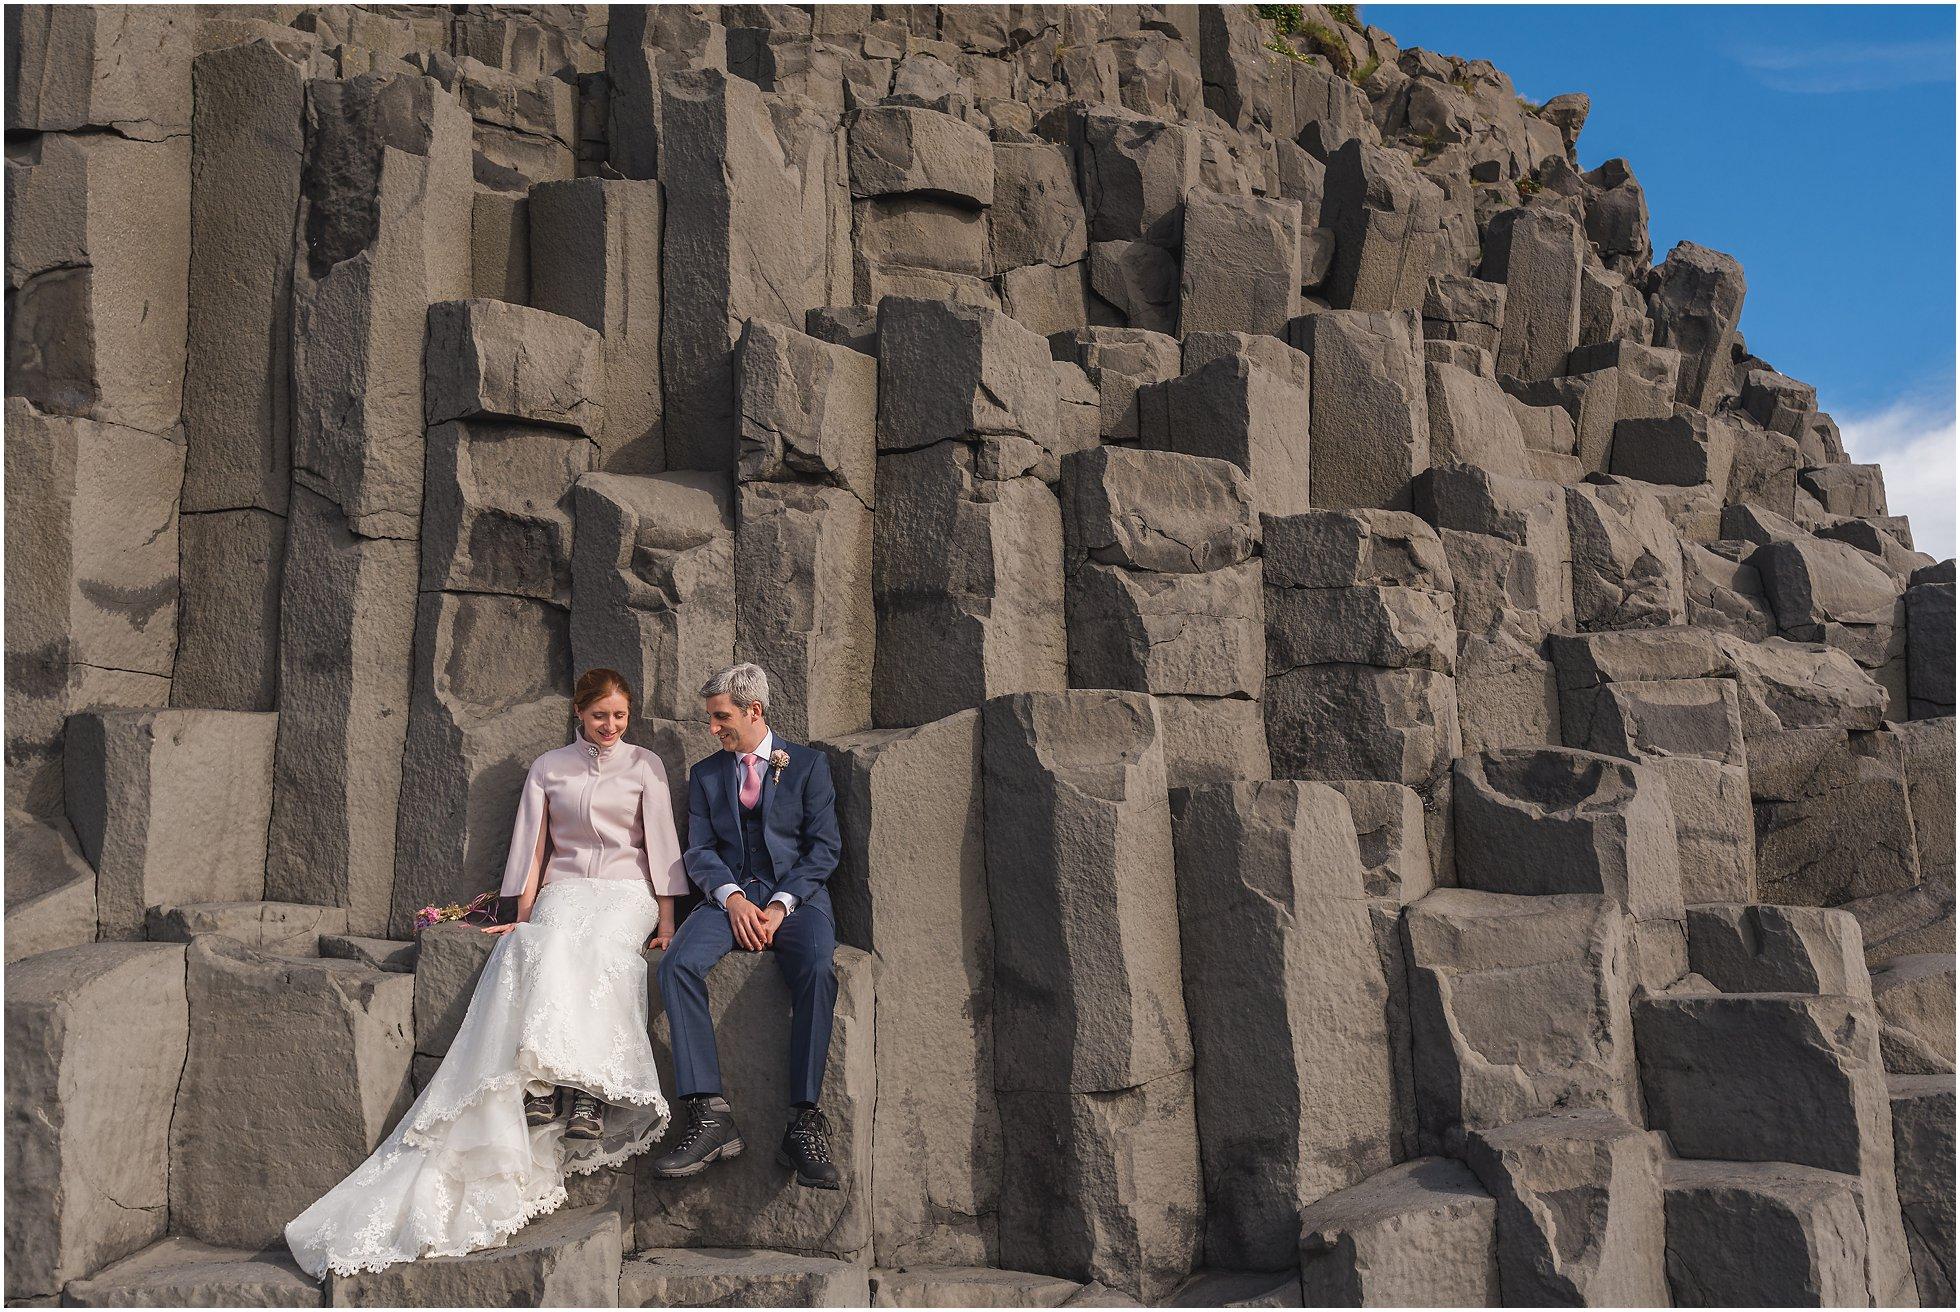 Reynisfjara rock formation wedding photography